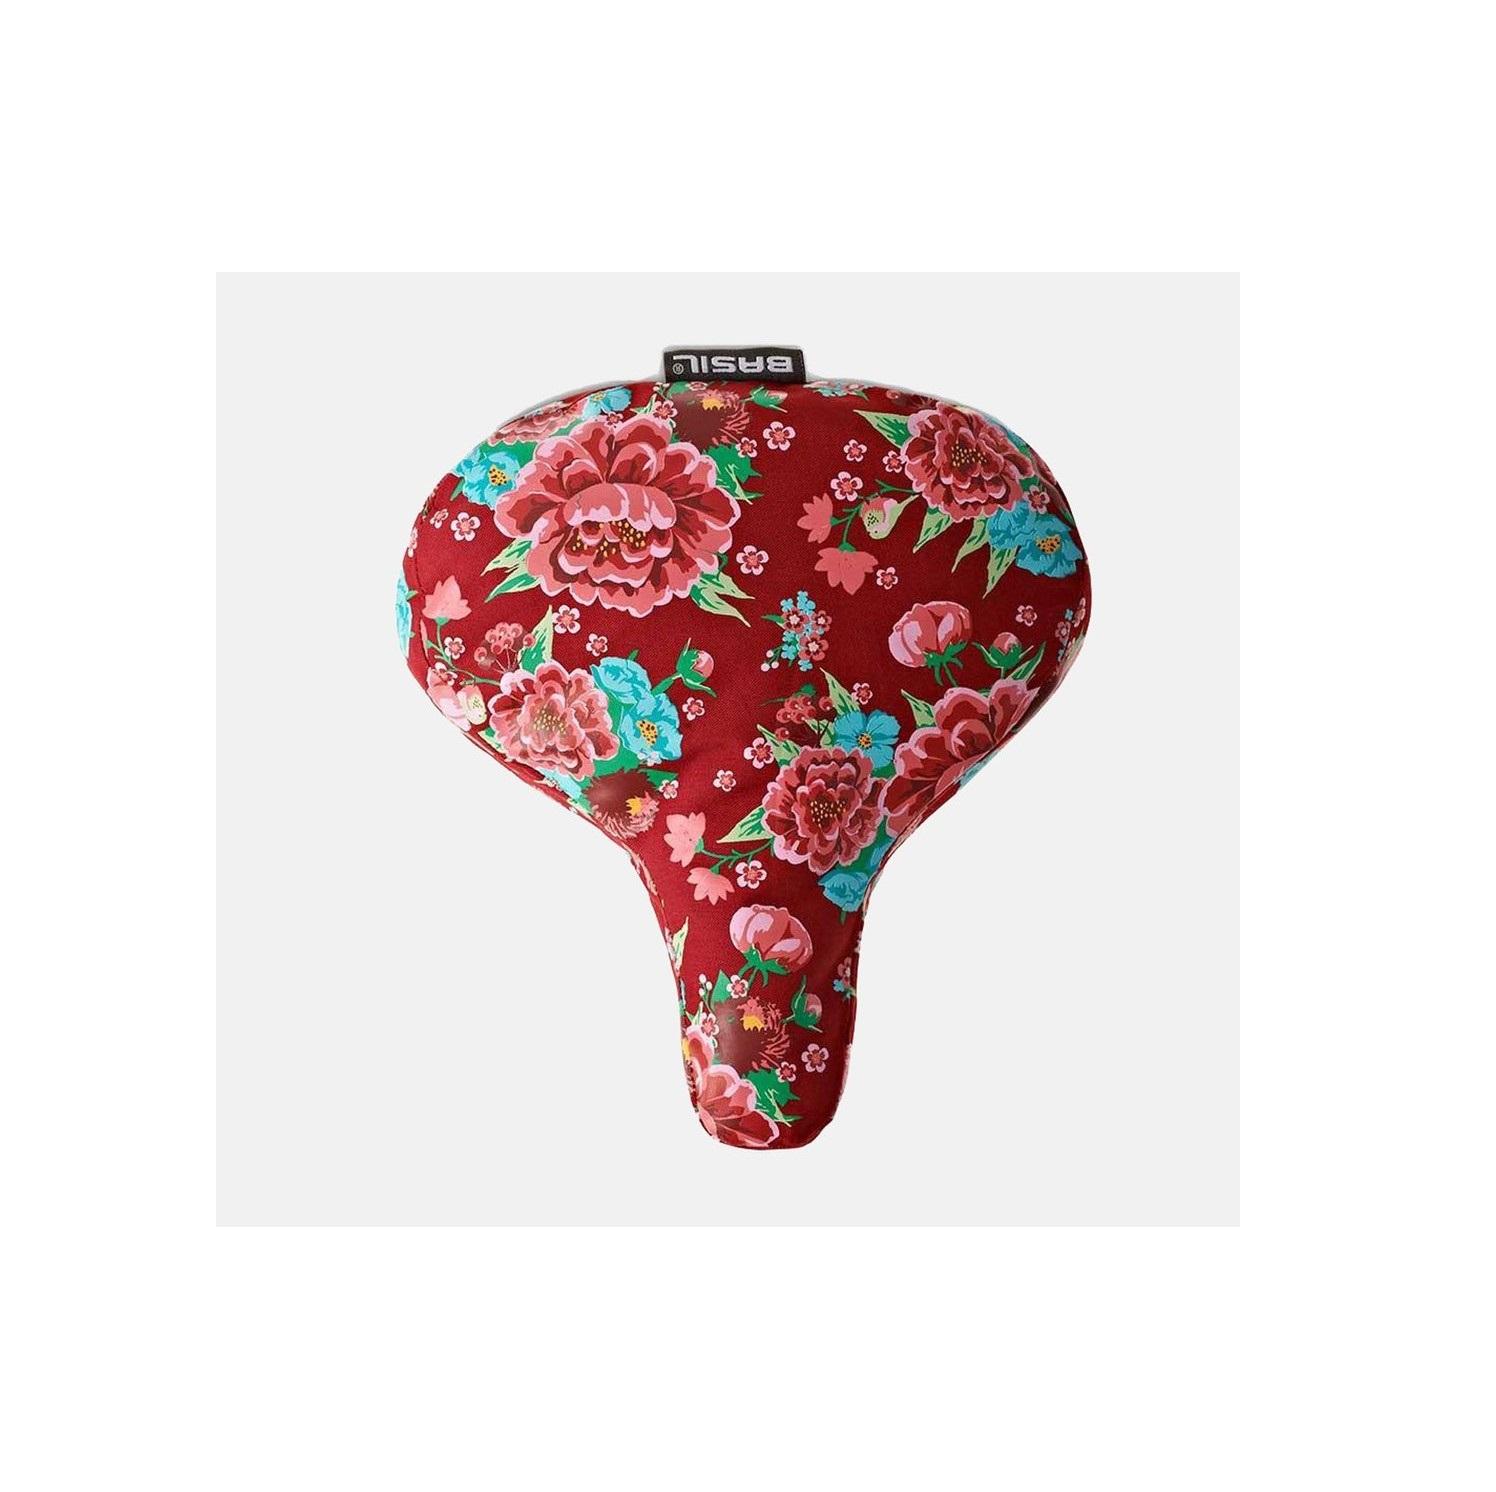 Capa de Selim Basil Bloom Saddle Cover Scarlet Red Go By Bike